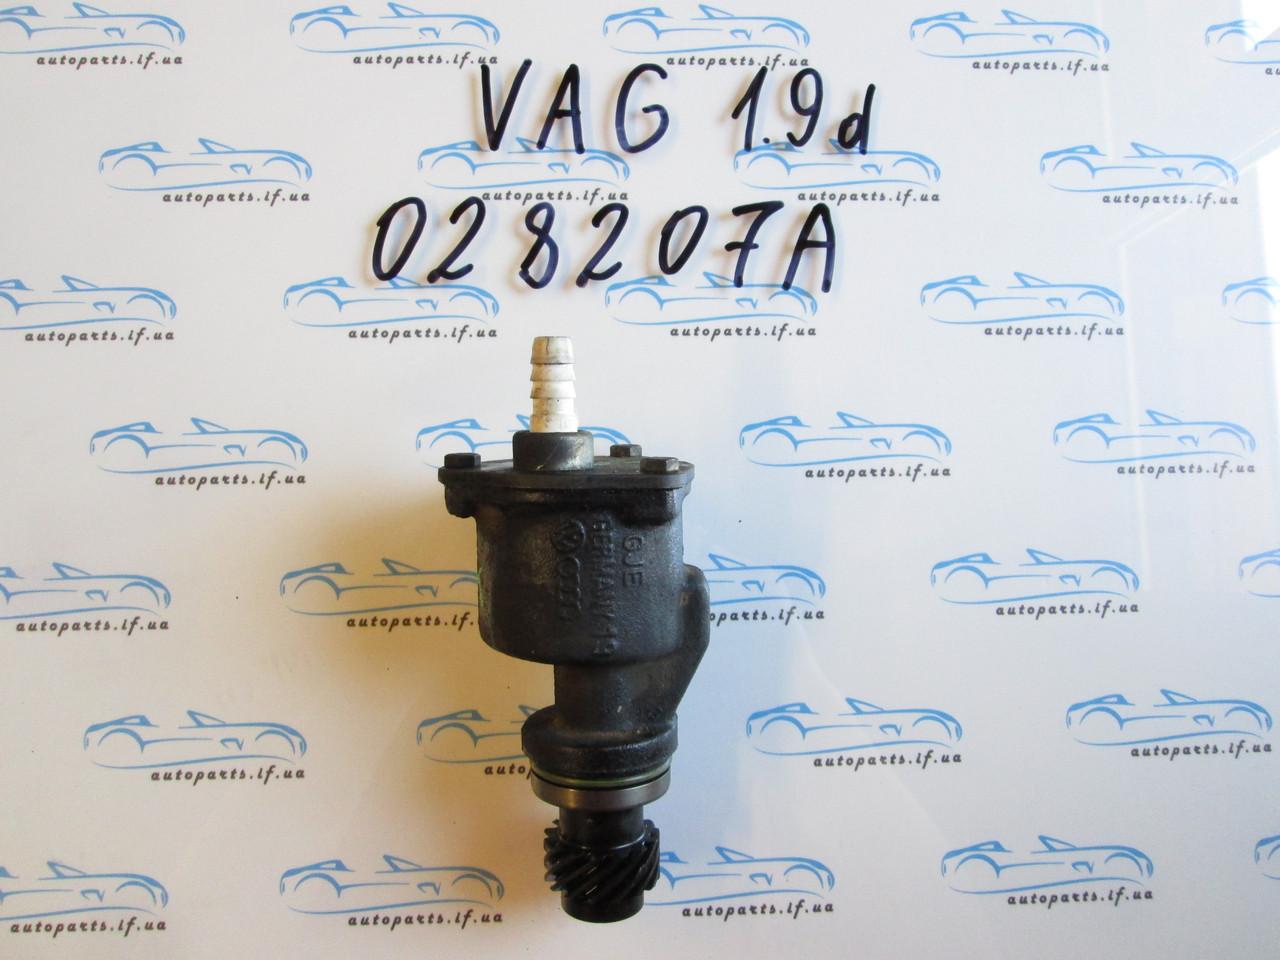 Вакуумний насос VAG 1.9 TDI 028207A